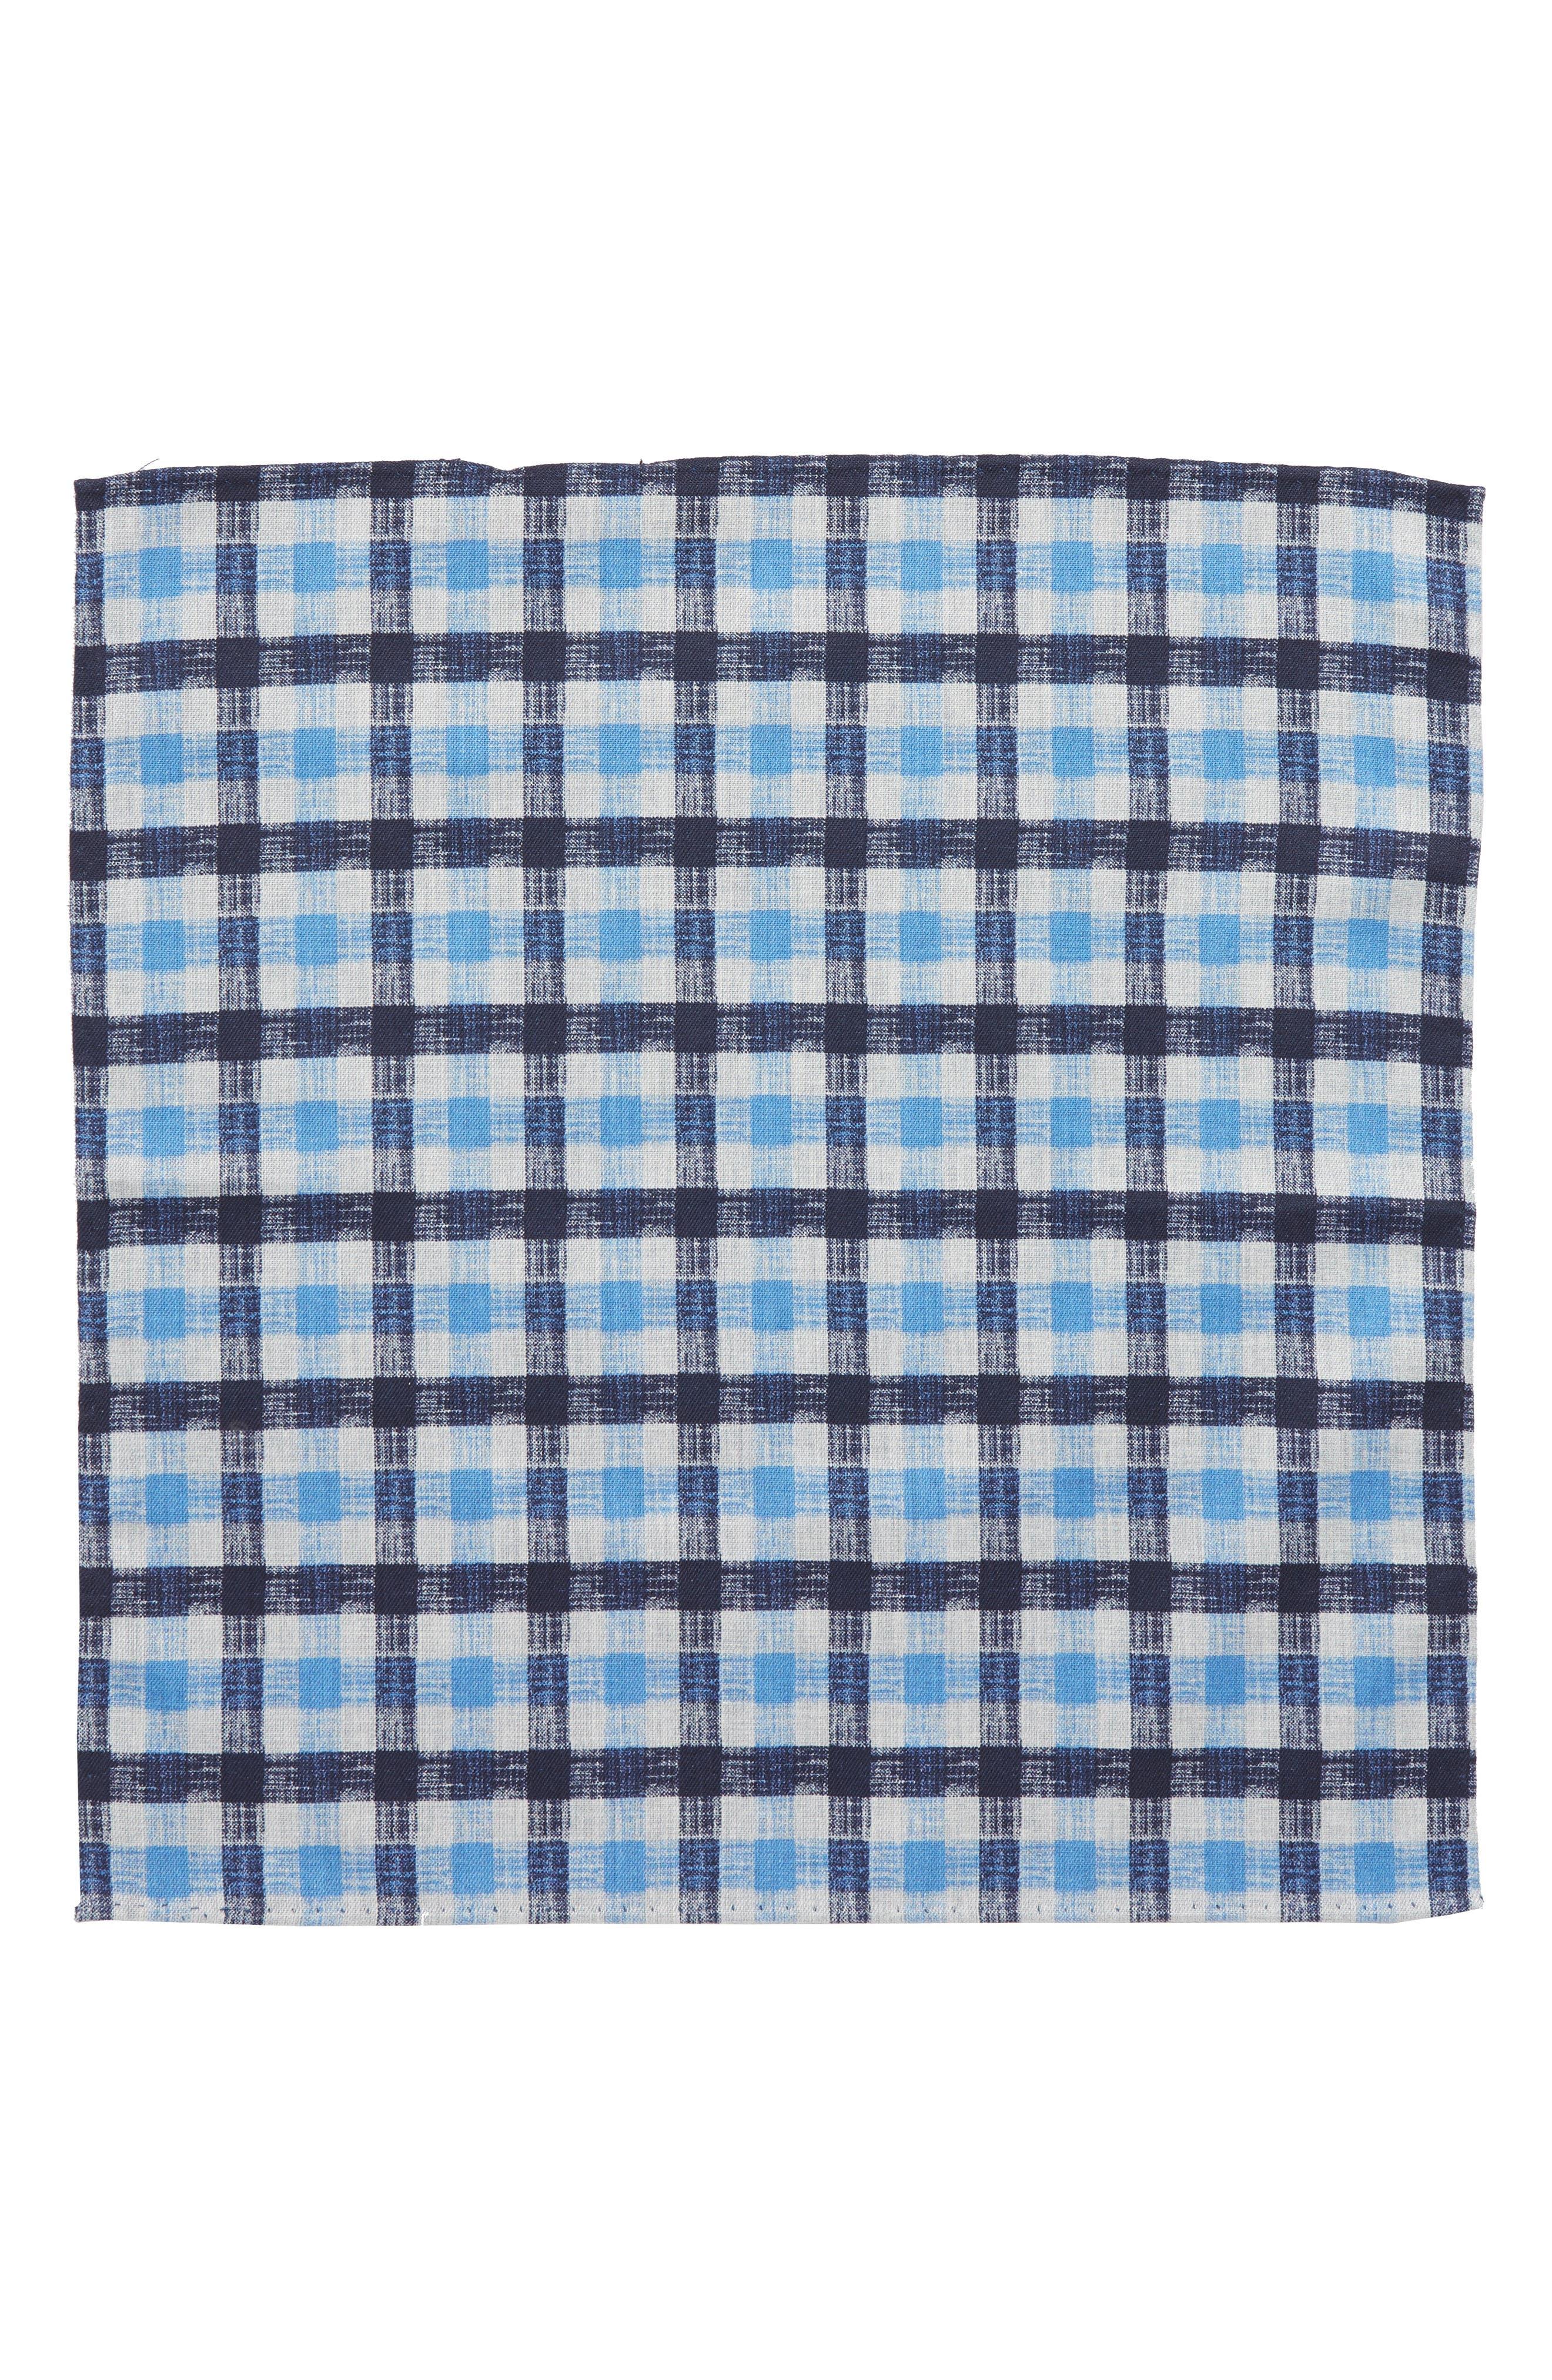 NORDSTROM MEN'S SHOP,                             Check Silk Pocket Square,                             Alternate thumbnail 2, color,                             400